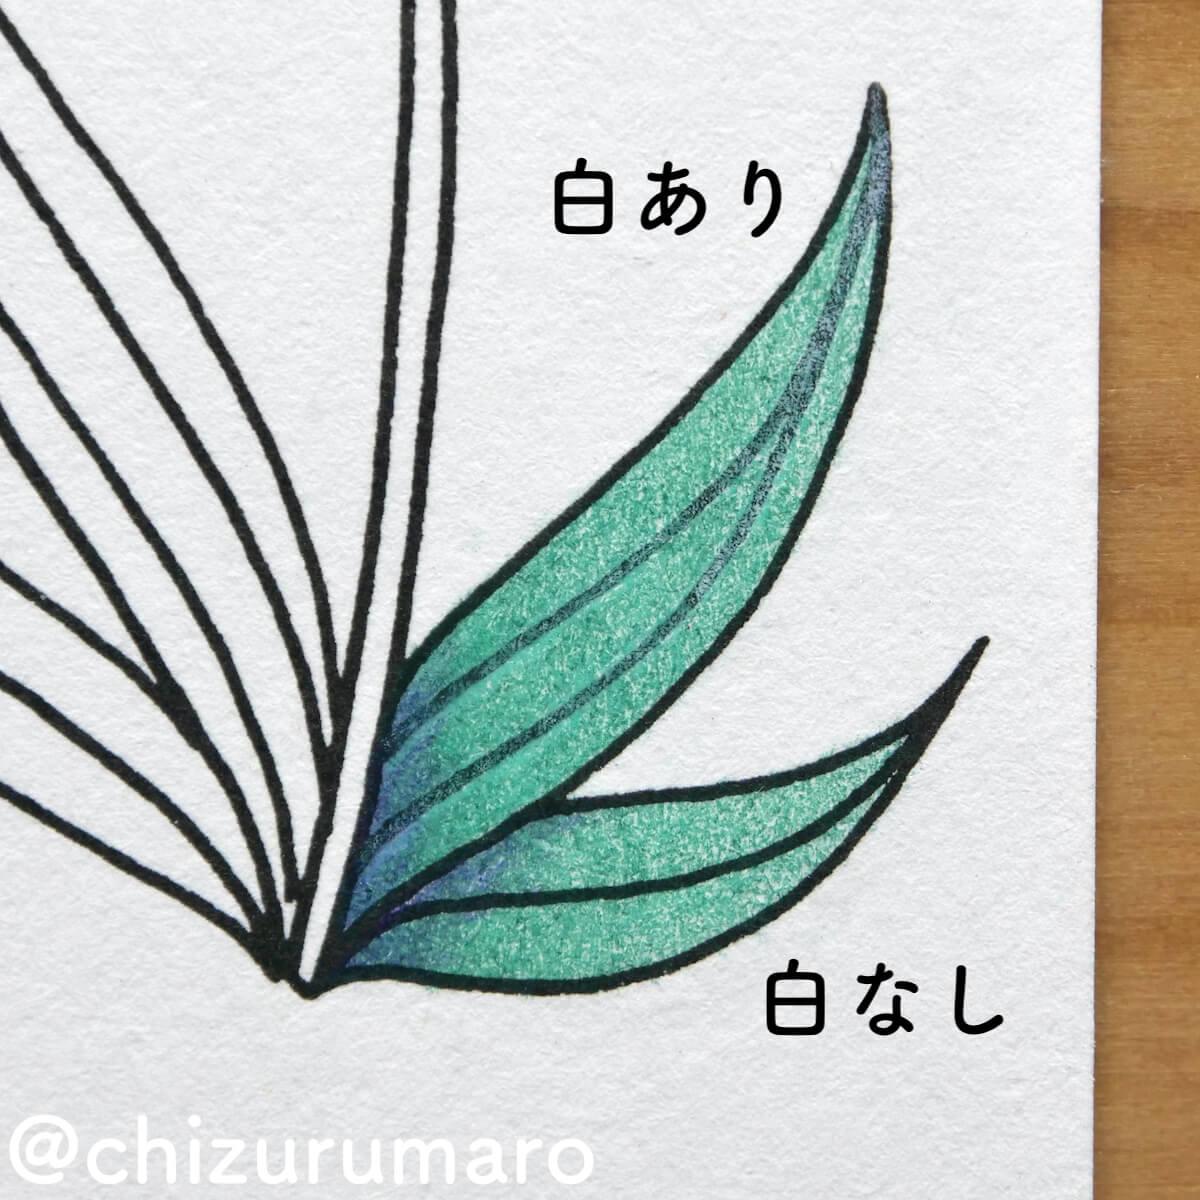 f:id:chizurumaro:20210819124518j:plain